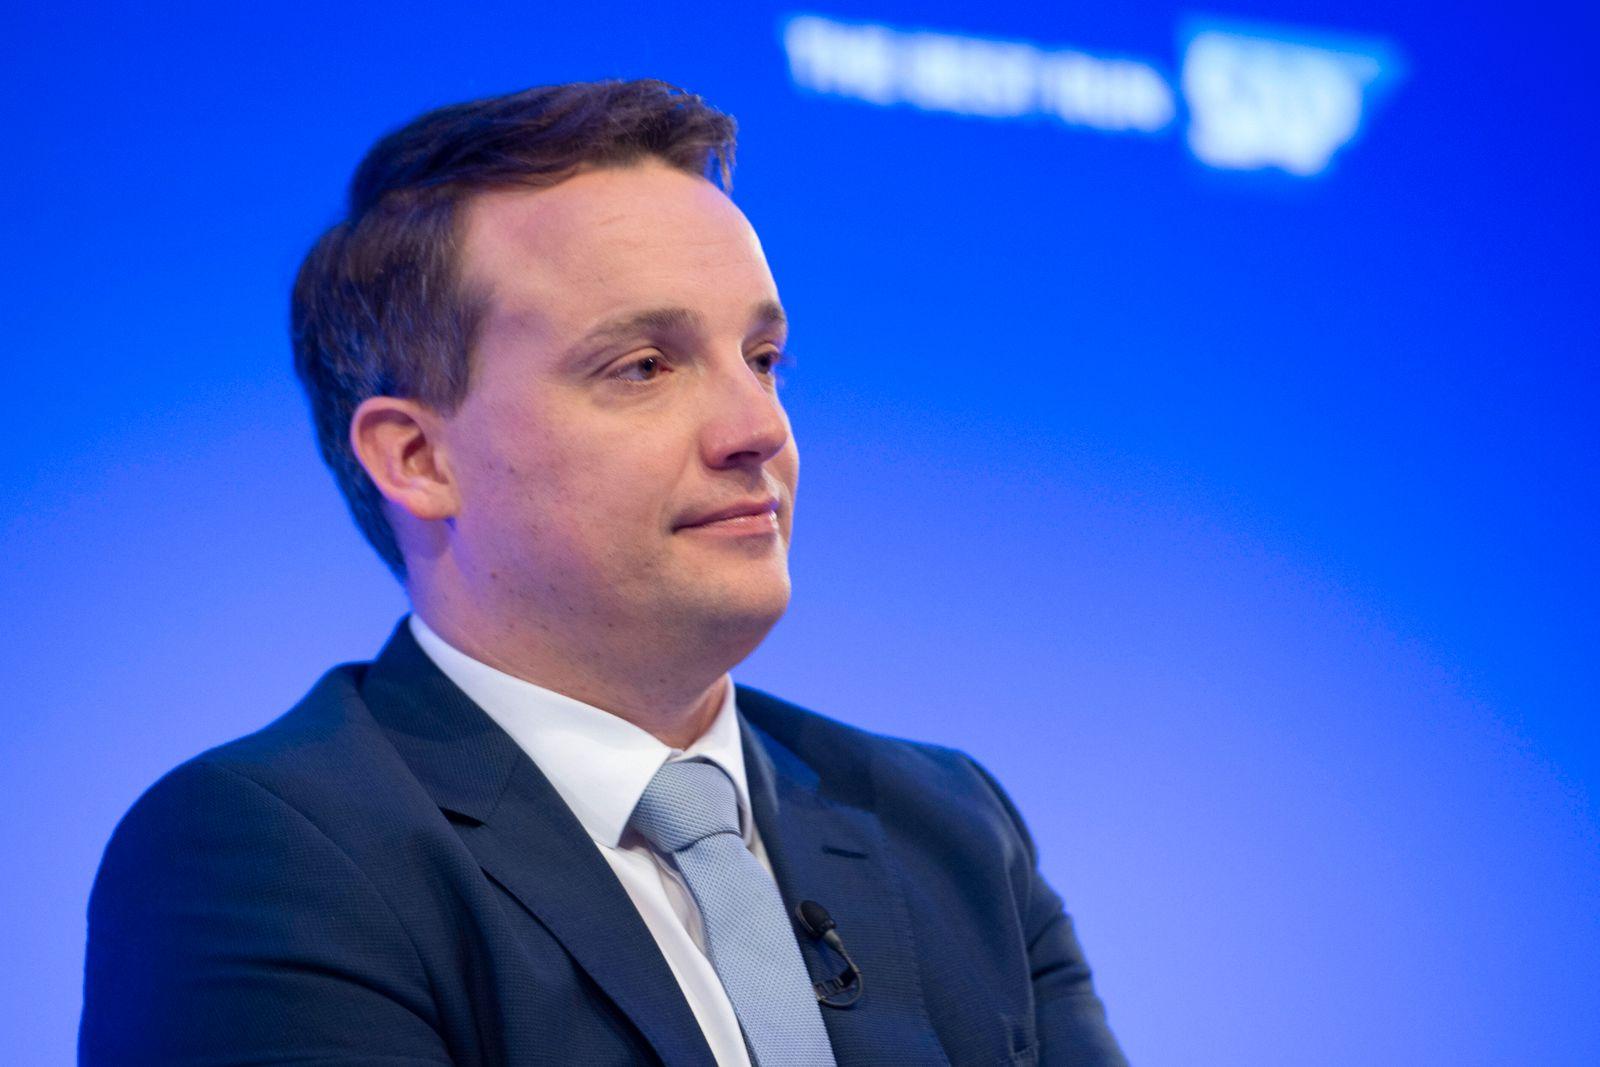 Christian KLEIN, Co-Vorstandssprecher (Co-CEO) Bilanzpressekonferenz der SAP AG in Walldorf, 28.01.2020. *** Christian